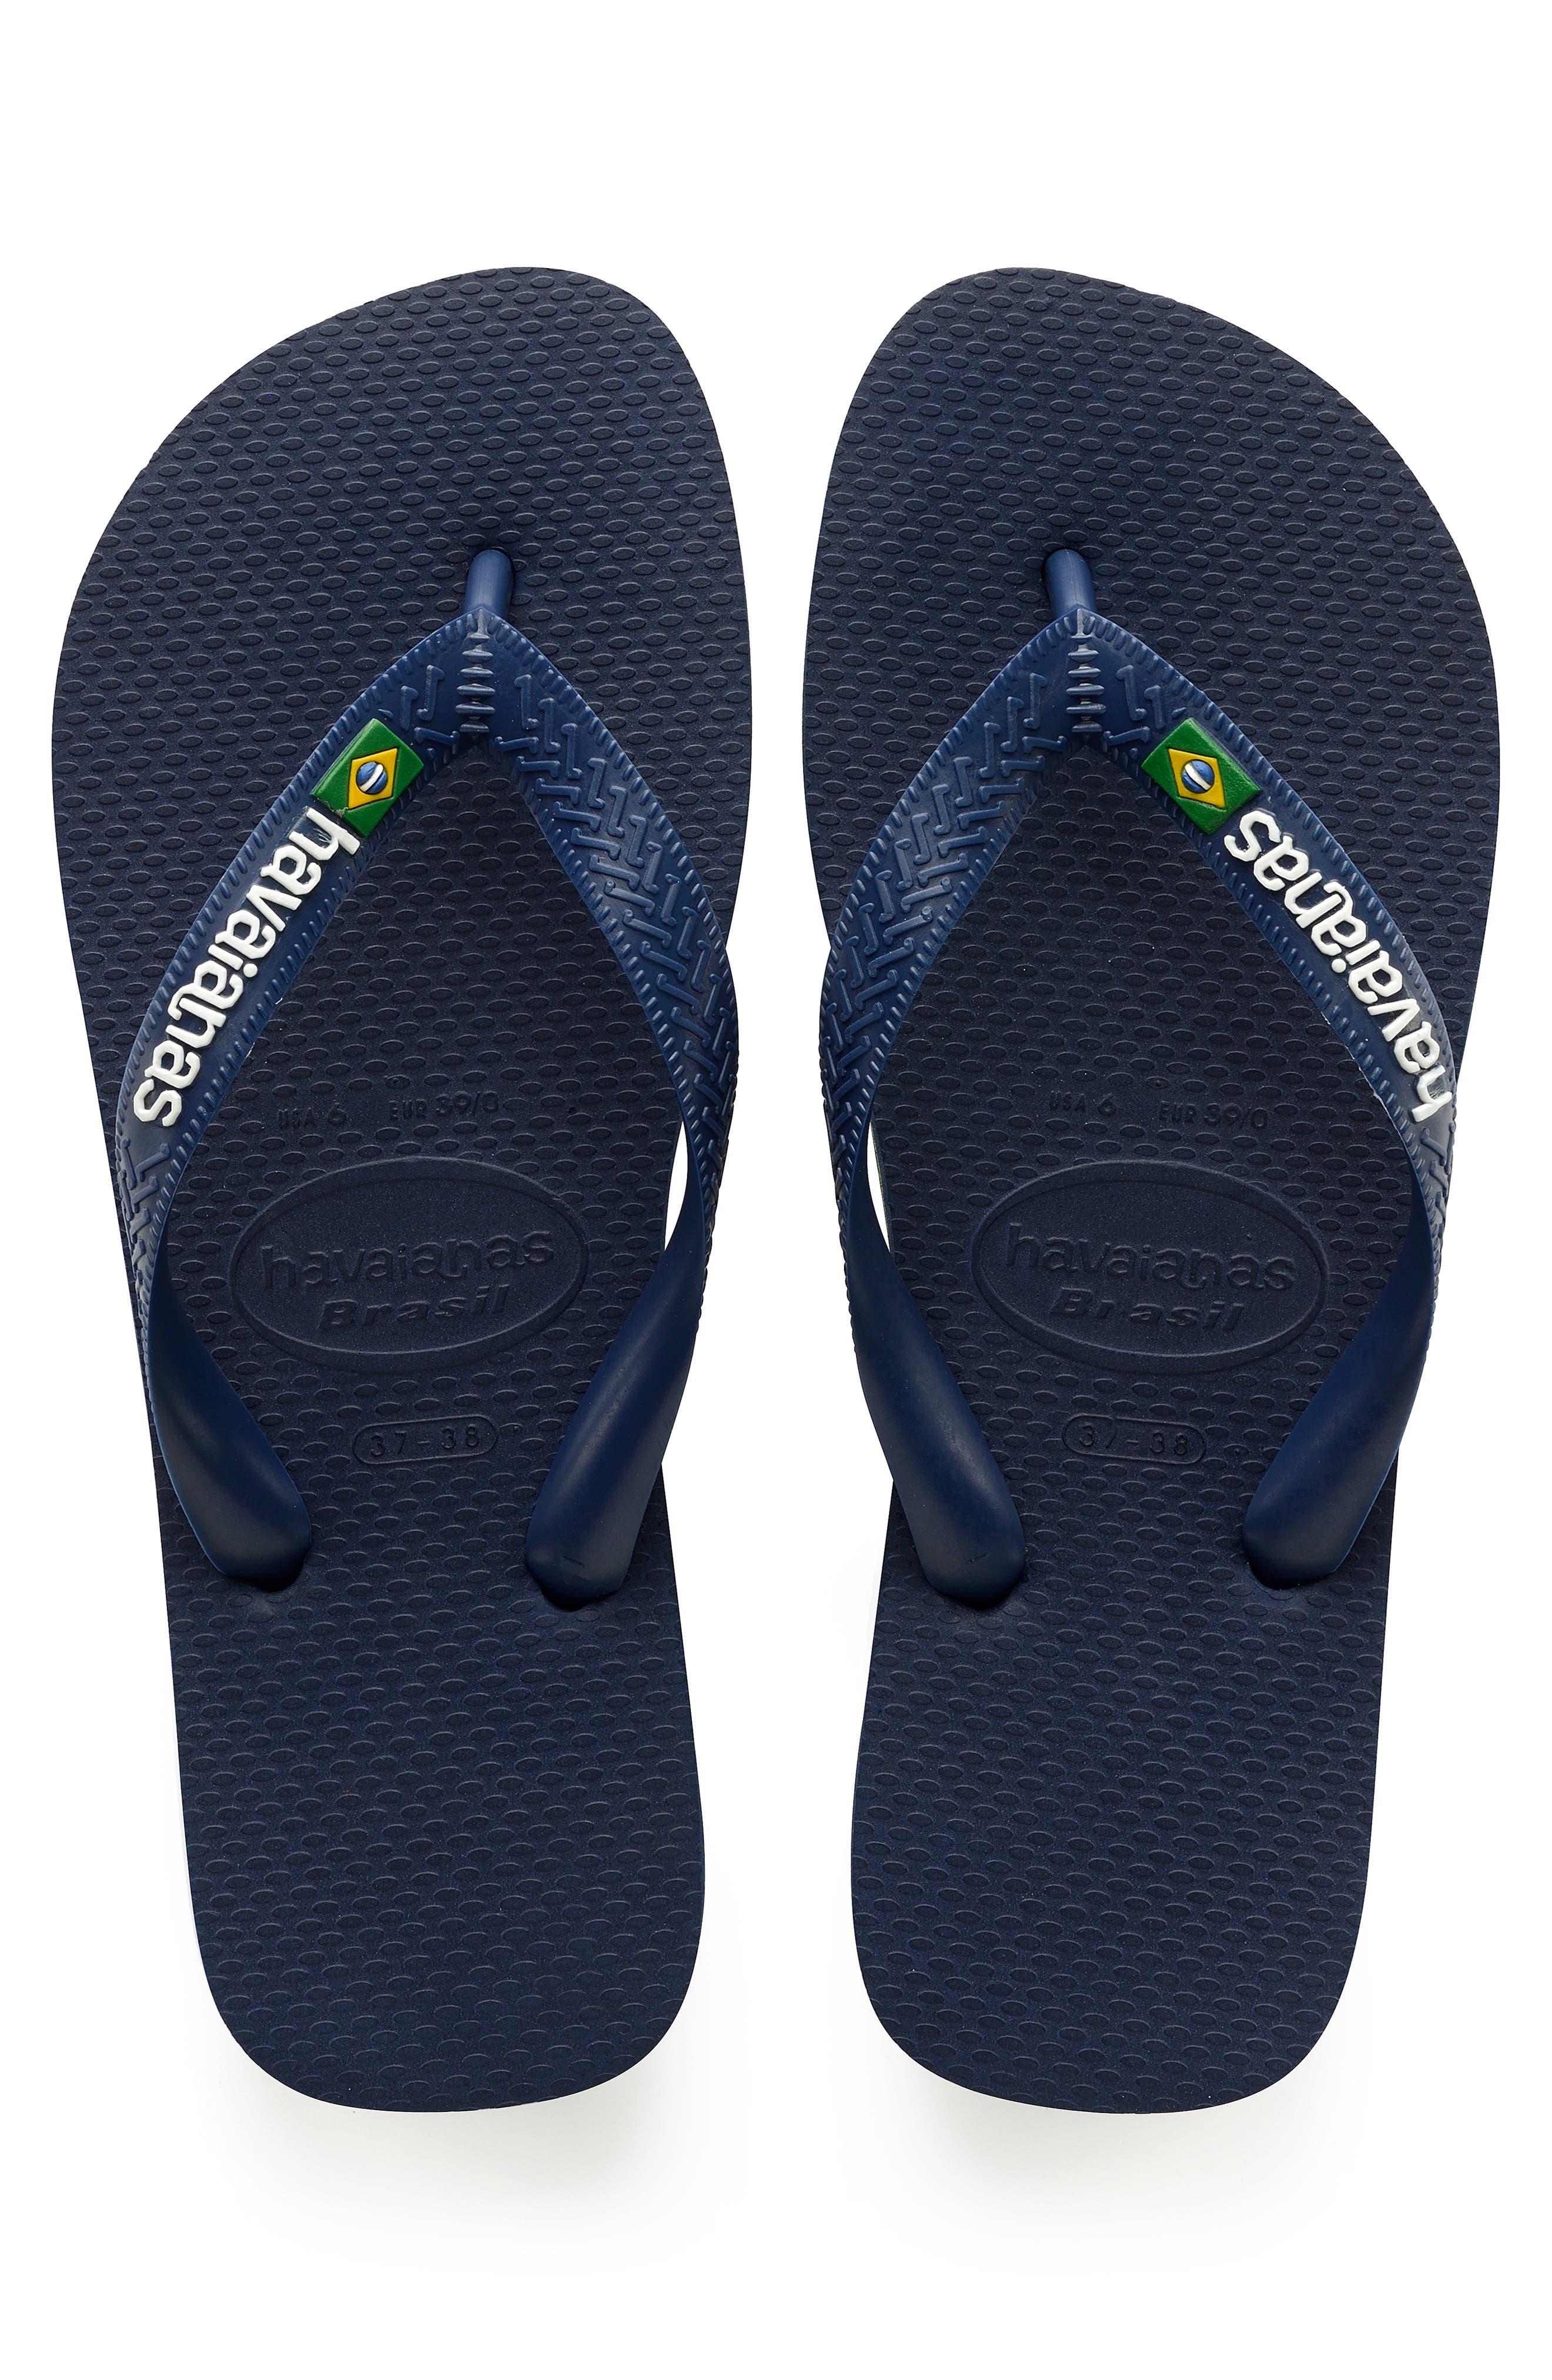 f8d006b9ca78 Havaianas Flip-Flops for Men